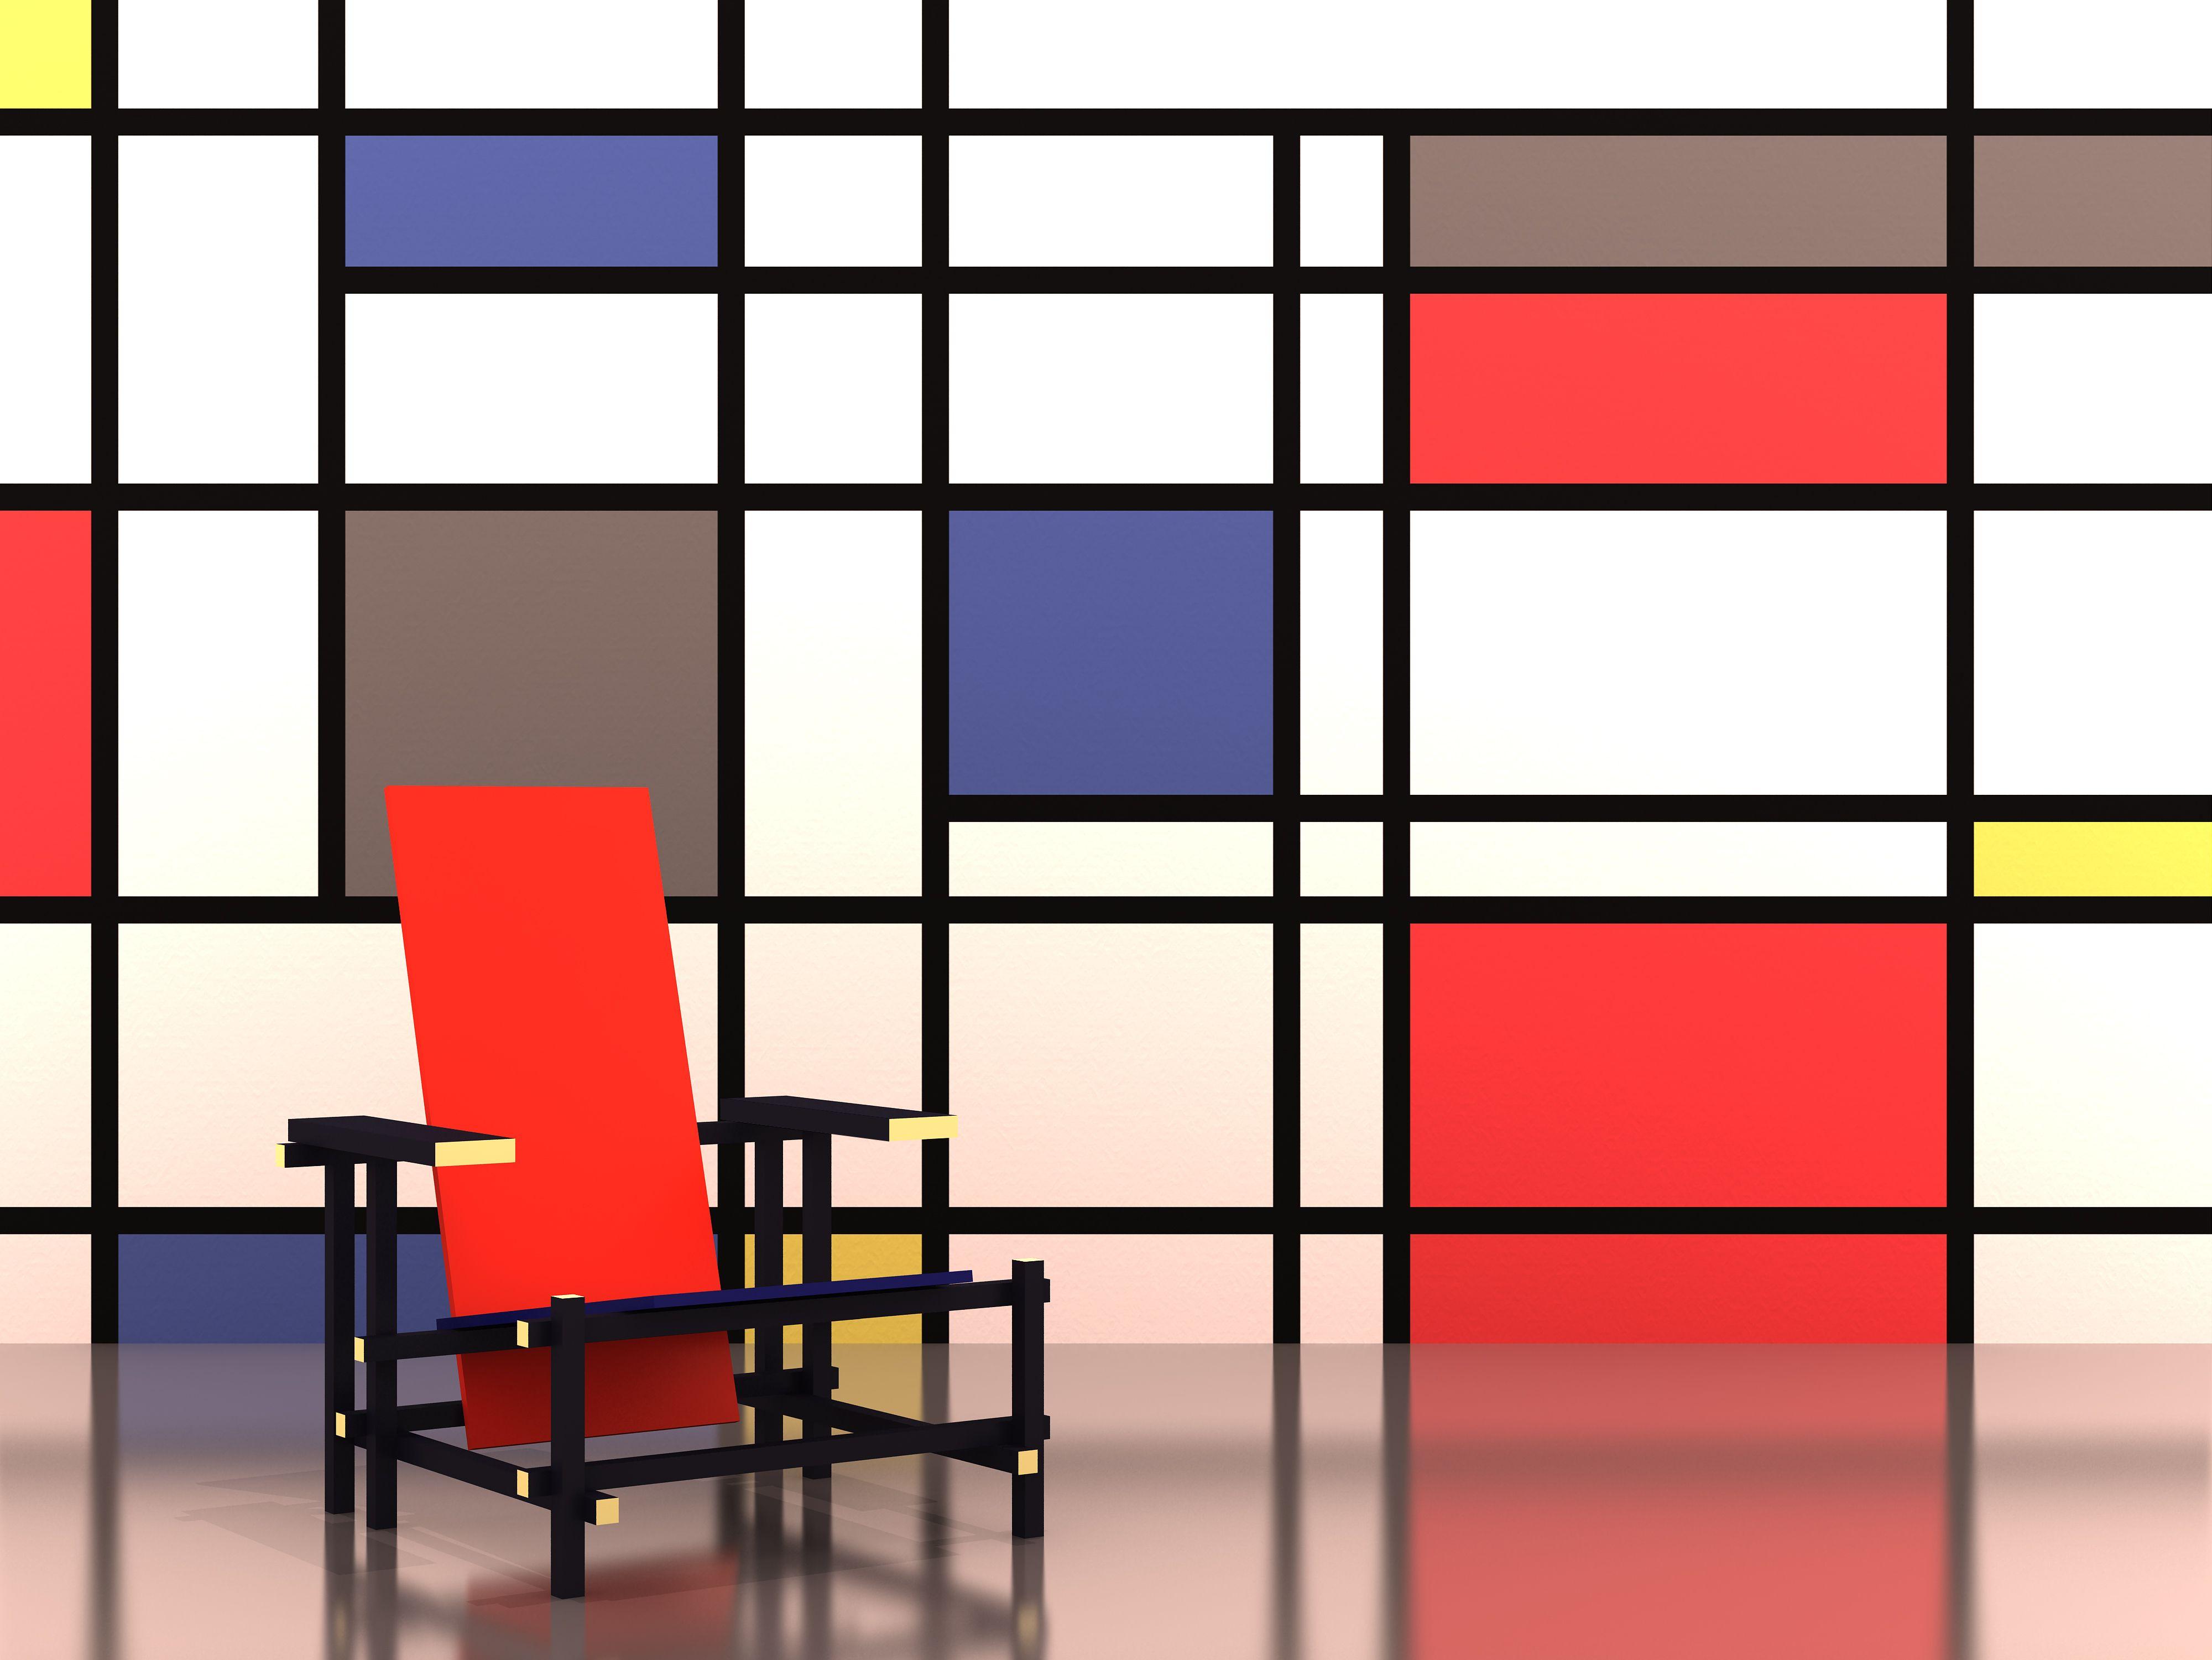 Awe Inspiring Redblue Chair Of Rietveldstoel Gerrit Rietveld In 2019 Uwap Interior Chair Design Uwaporg